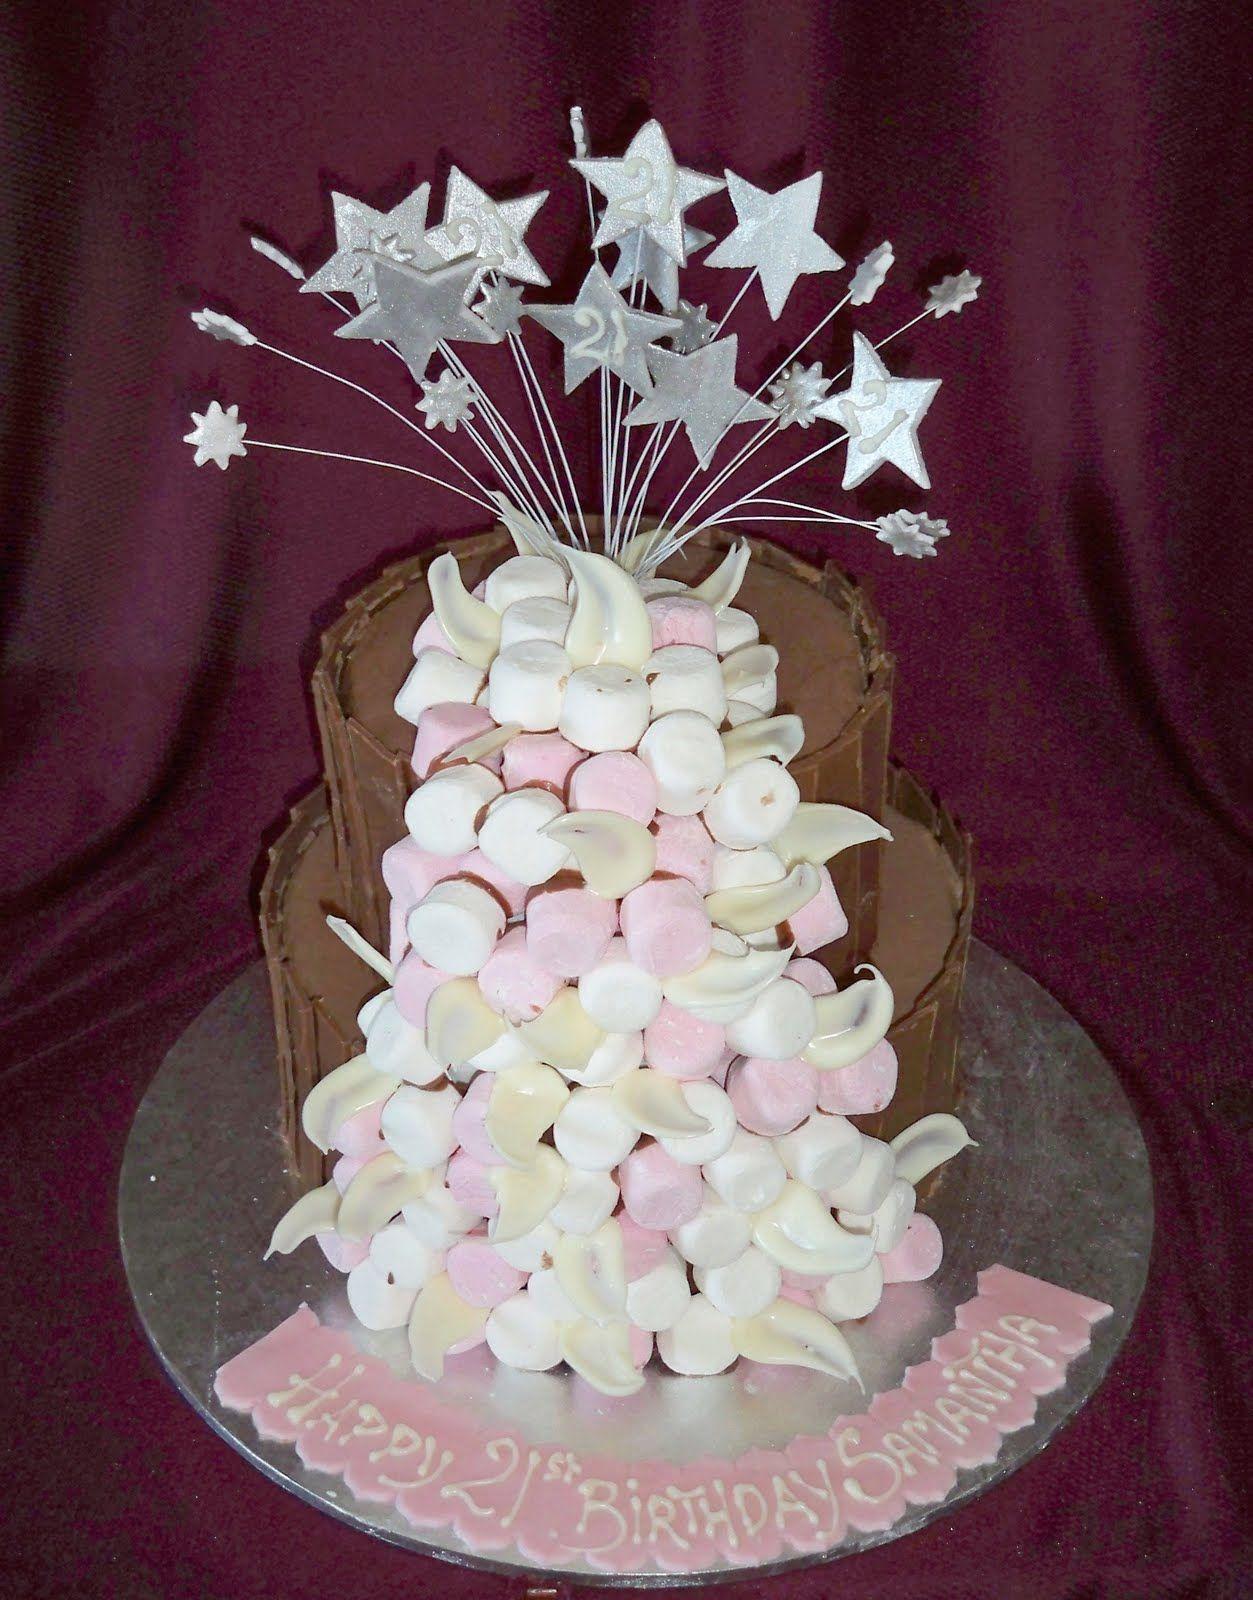 St Birthday Cake Creative Marshmallows Pinterest St - Latest 21st birthday cakes